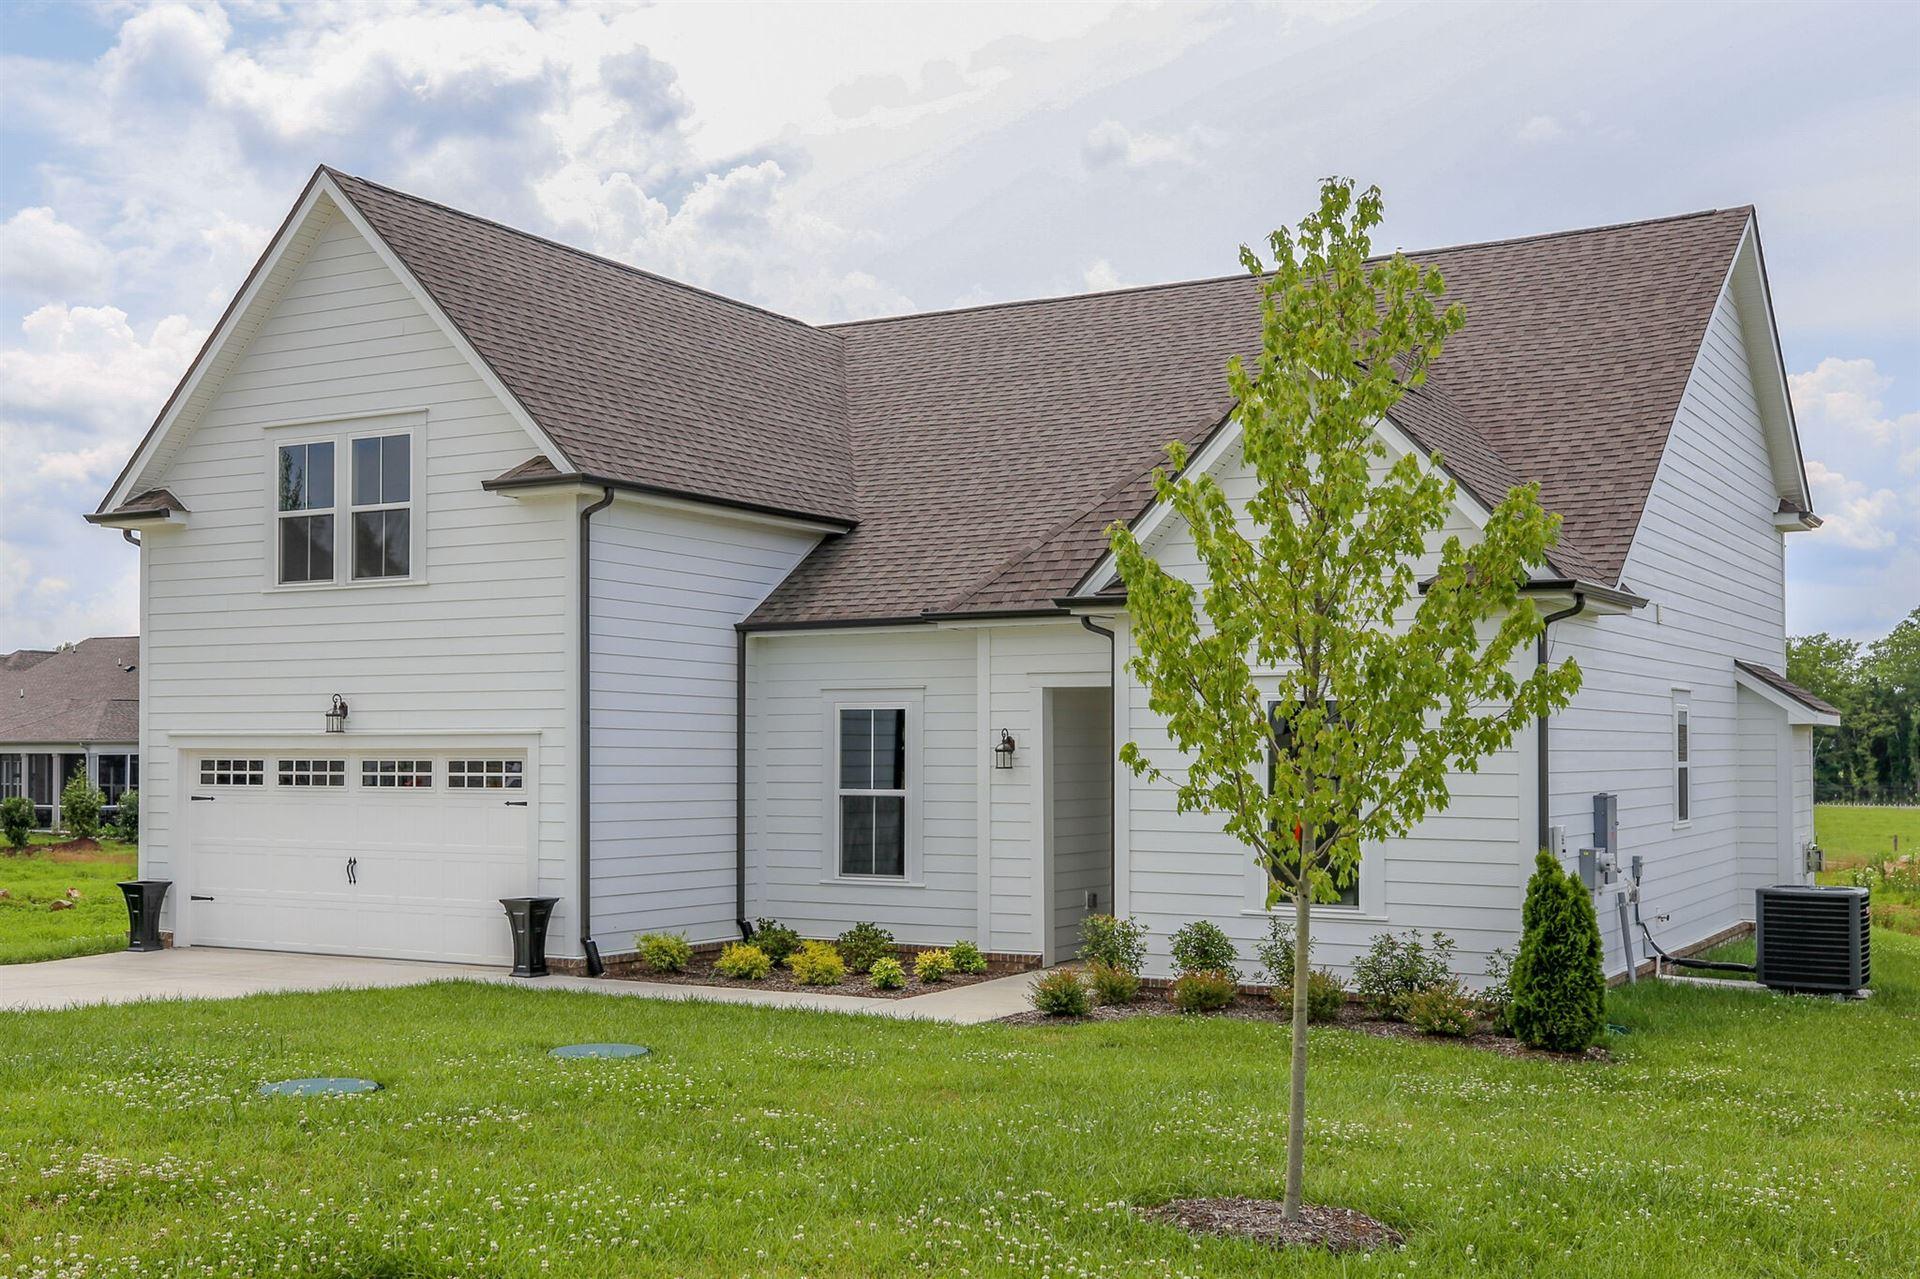 Photo of 1232 Batbriar Rd, Murfreesboro, TN 37128 (MLS # 2168300)